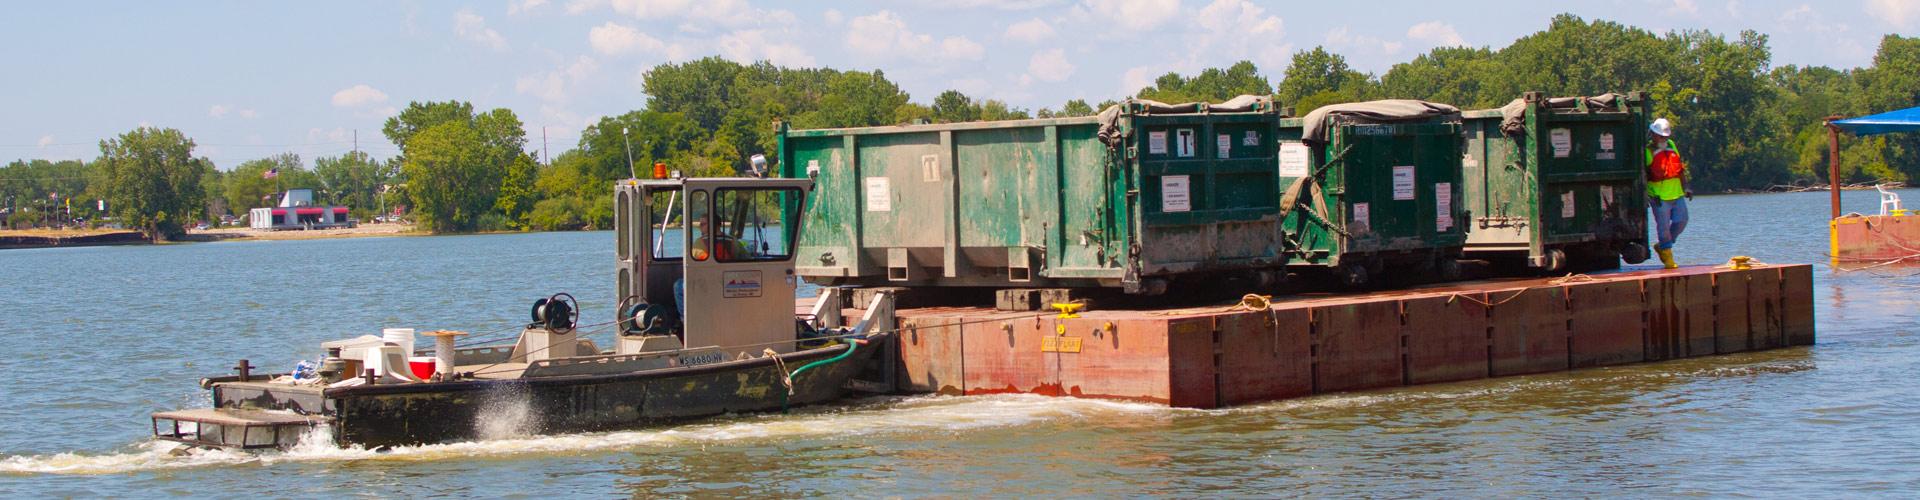 onmental Dredging, Precision mechanical dredging, Hydraulic dredging, amphibious dredging, diver-assisted micro-dredging, Mechanical Dredging, Environmental Remediation, Environmental Cleanup, remedial dredging, surgical hydraulic dredging, separation & dewatering, material transport